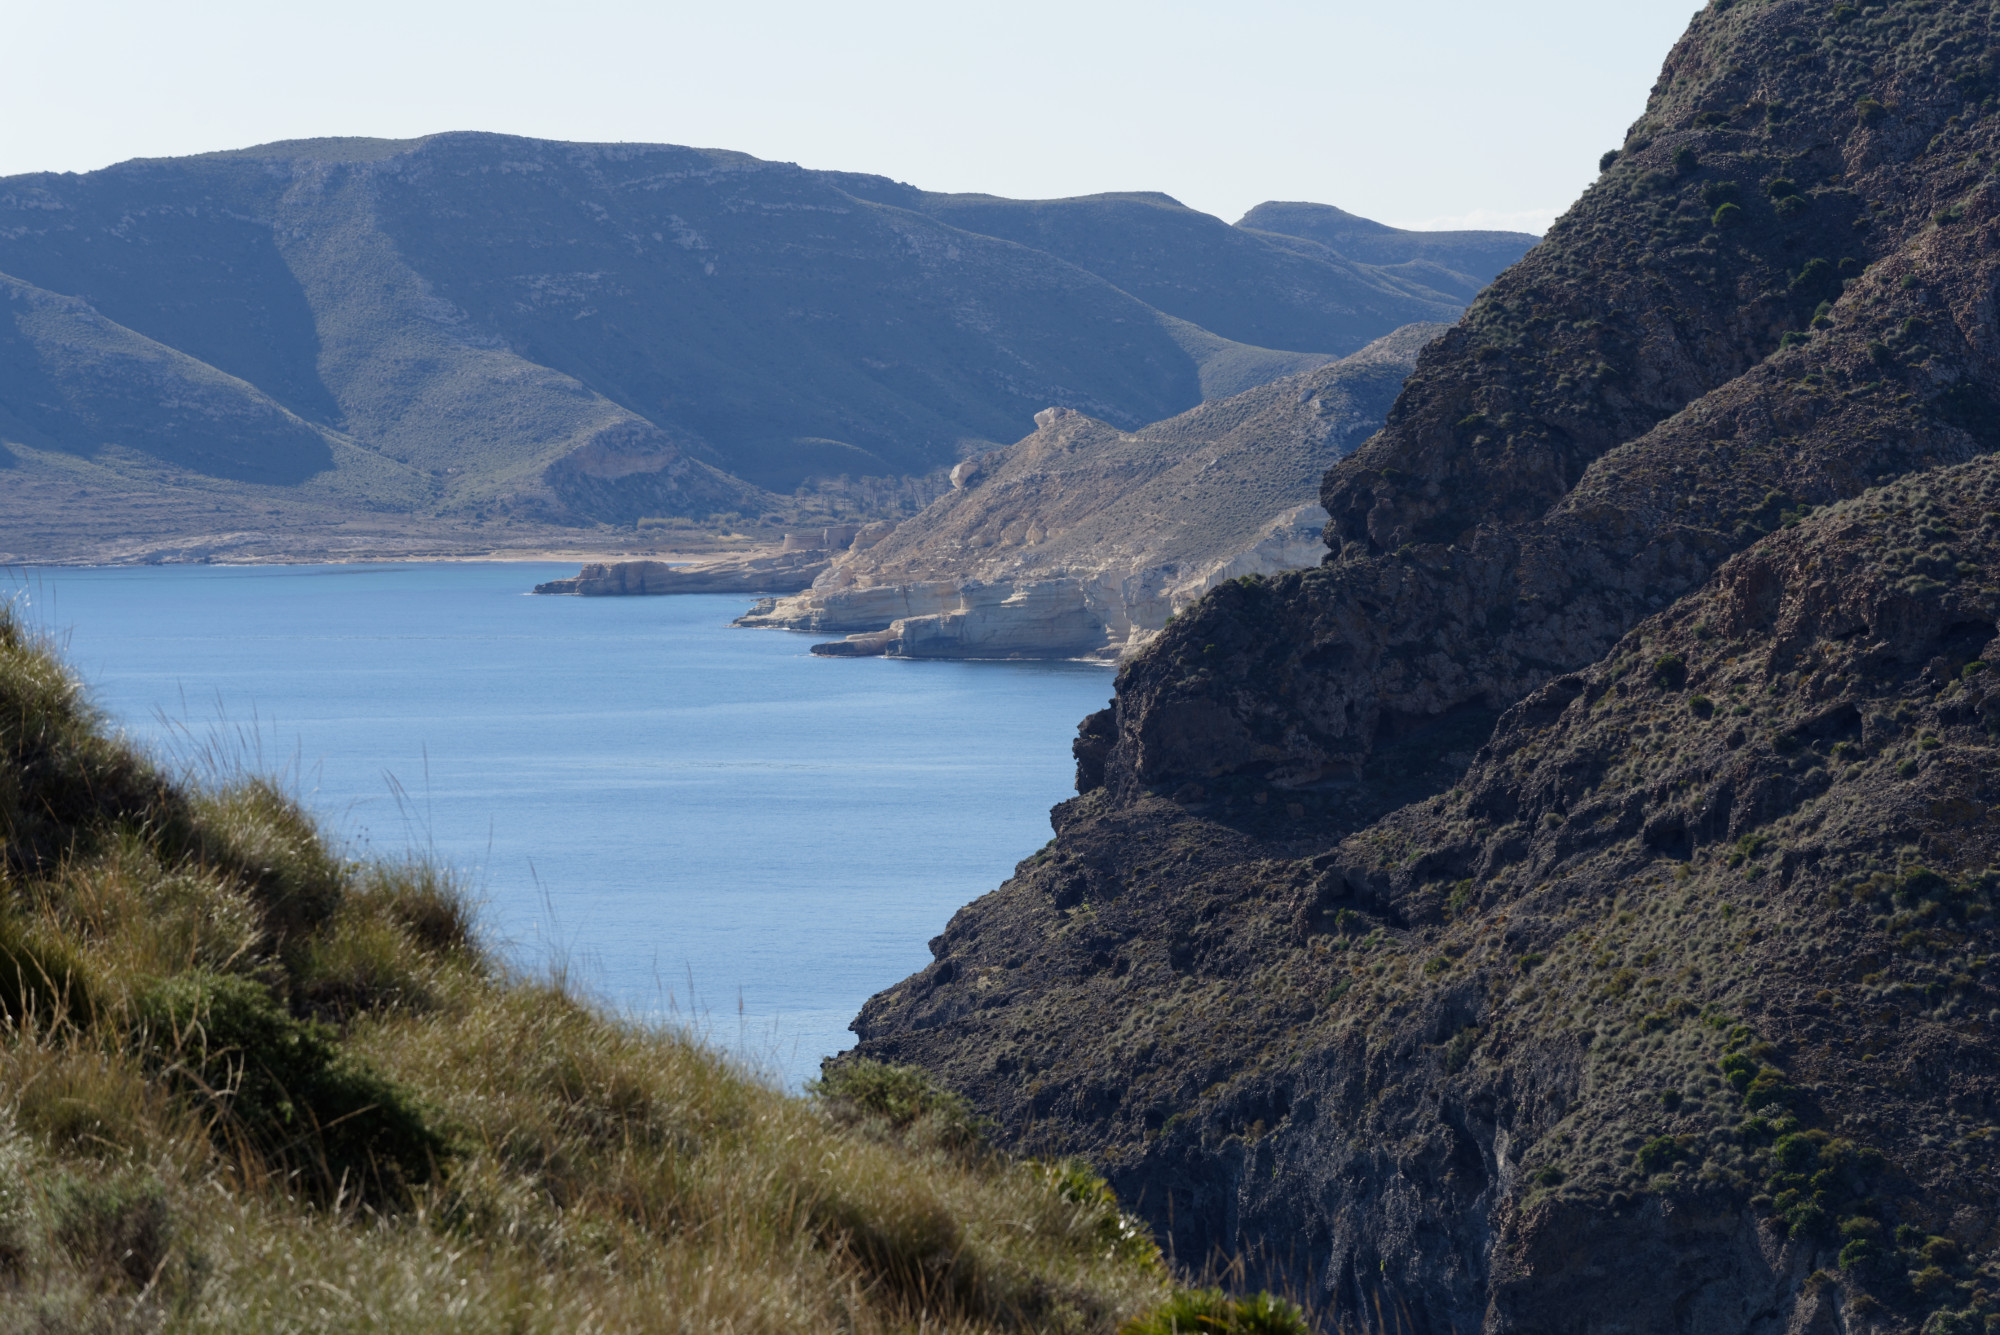 171213-Marche Las Negras-Cala San Pedro-Las Negras (27) (Cabo de Gata-Andalousie)